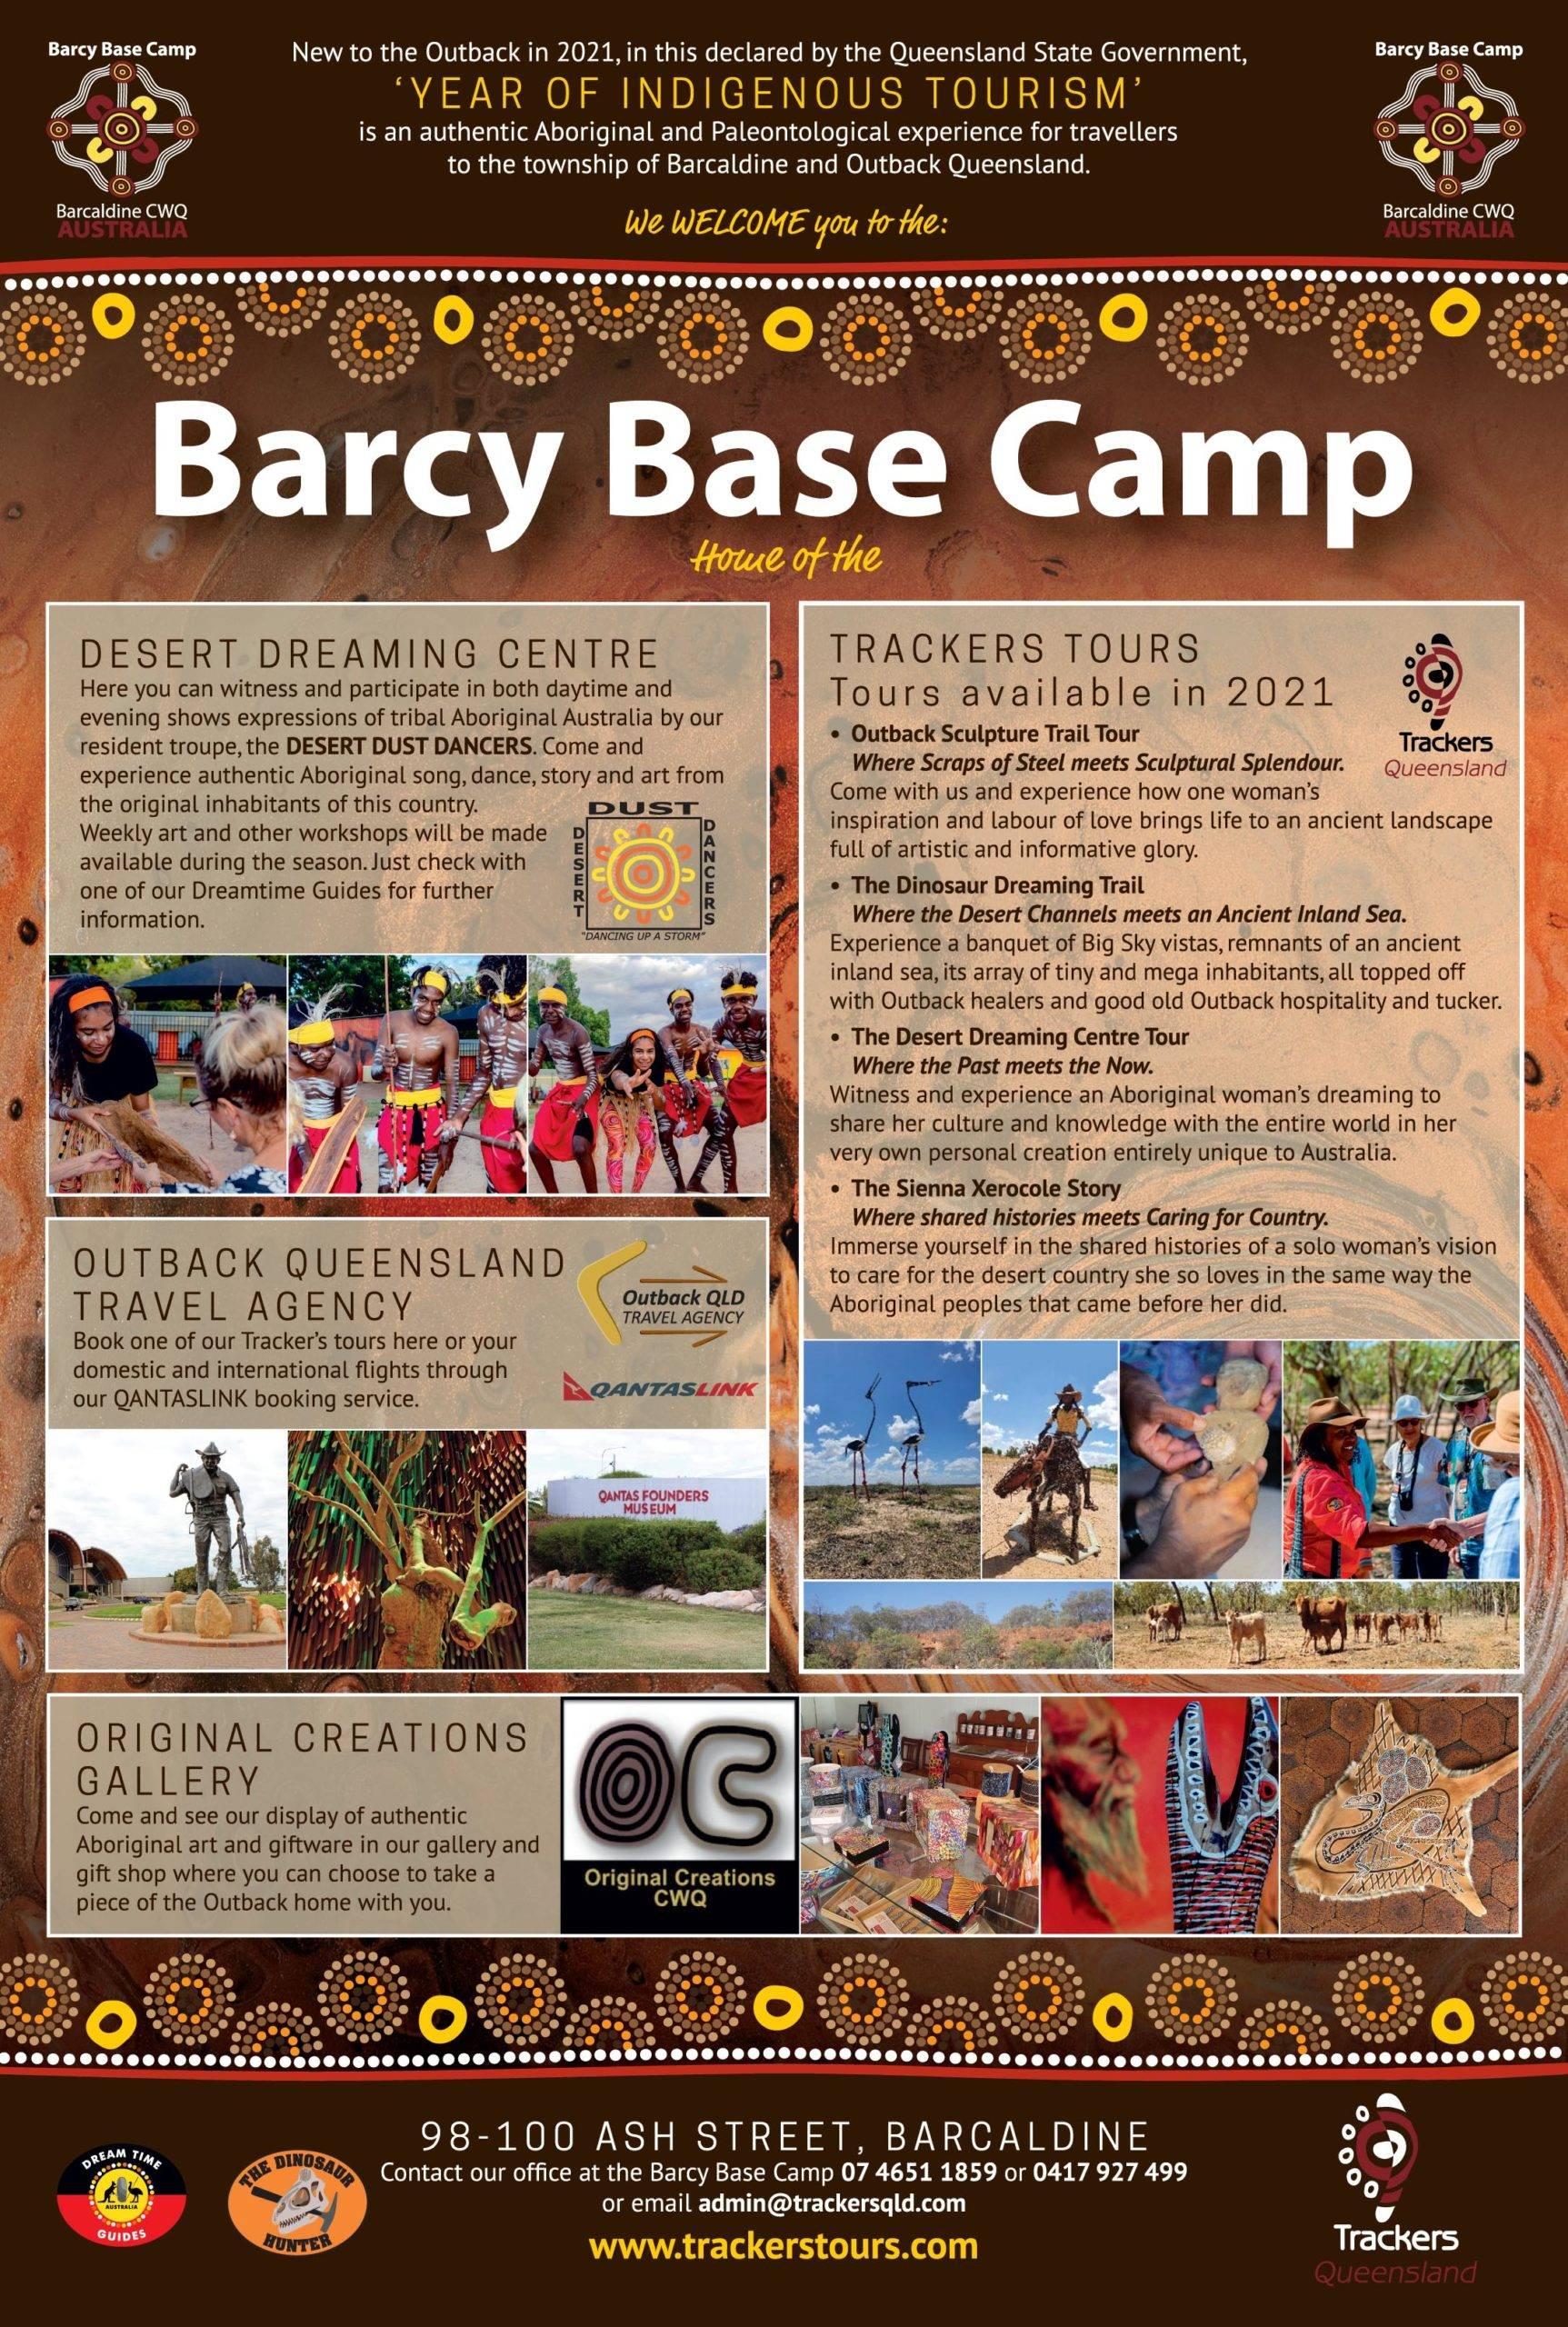 Barcy Base Camp